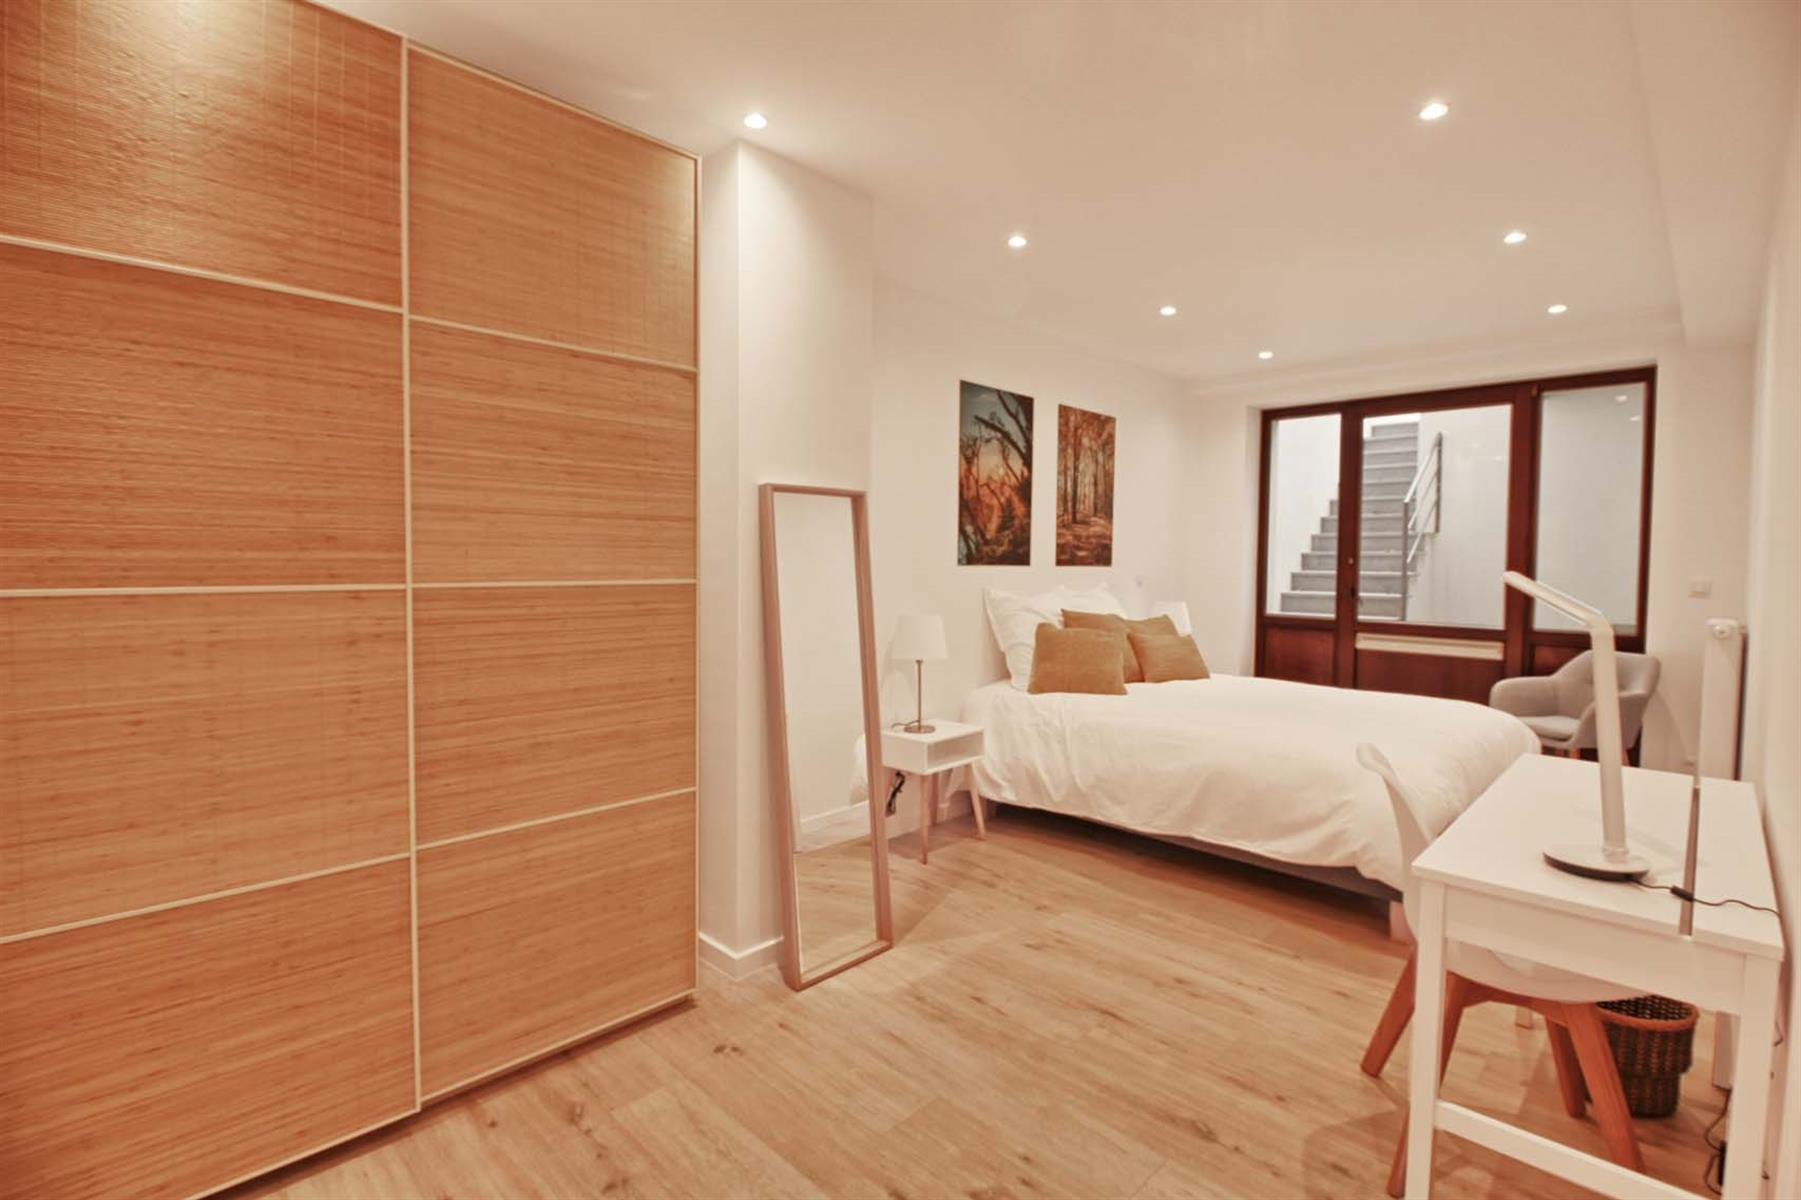 Maison - Ixelles - #4106764-7